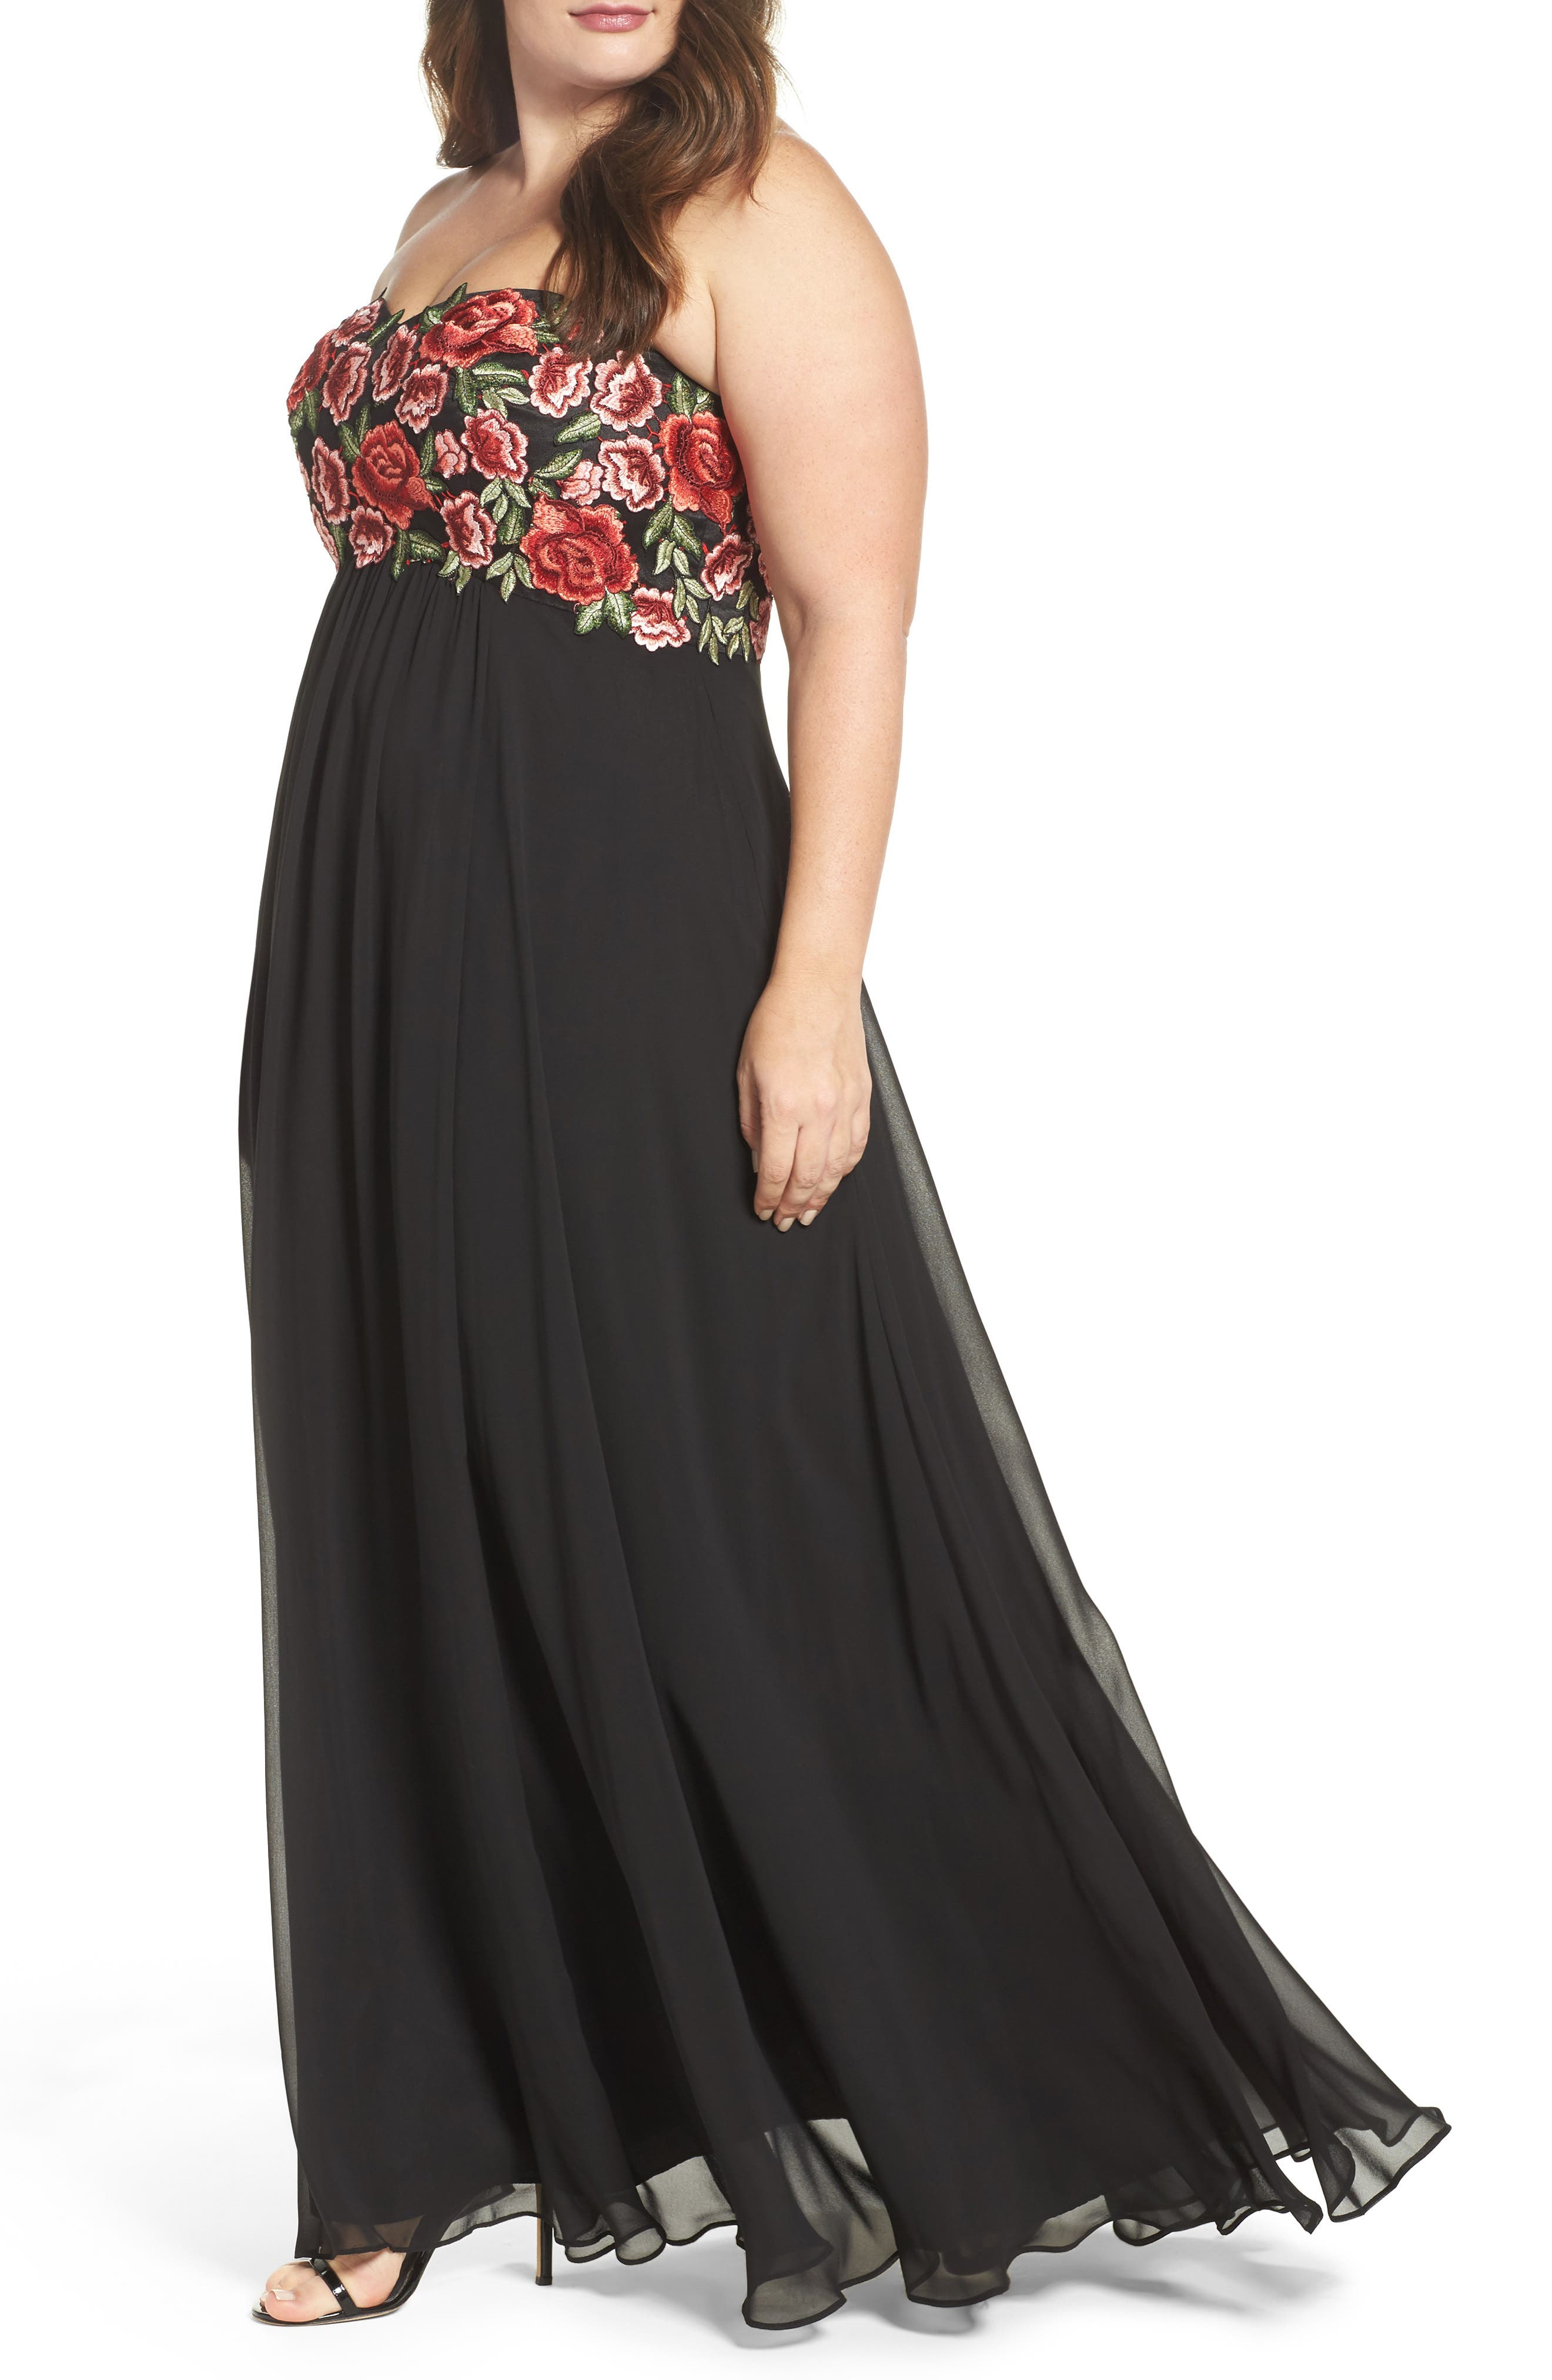 Floral Appliqué Strapless Gown,                             Alternate thumbnail 4, color,                             Black/ Red